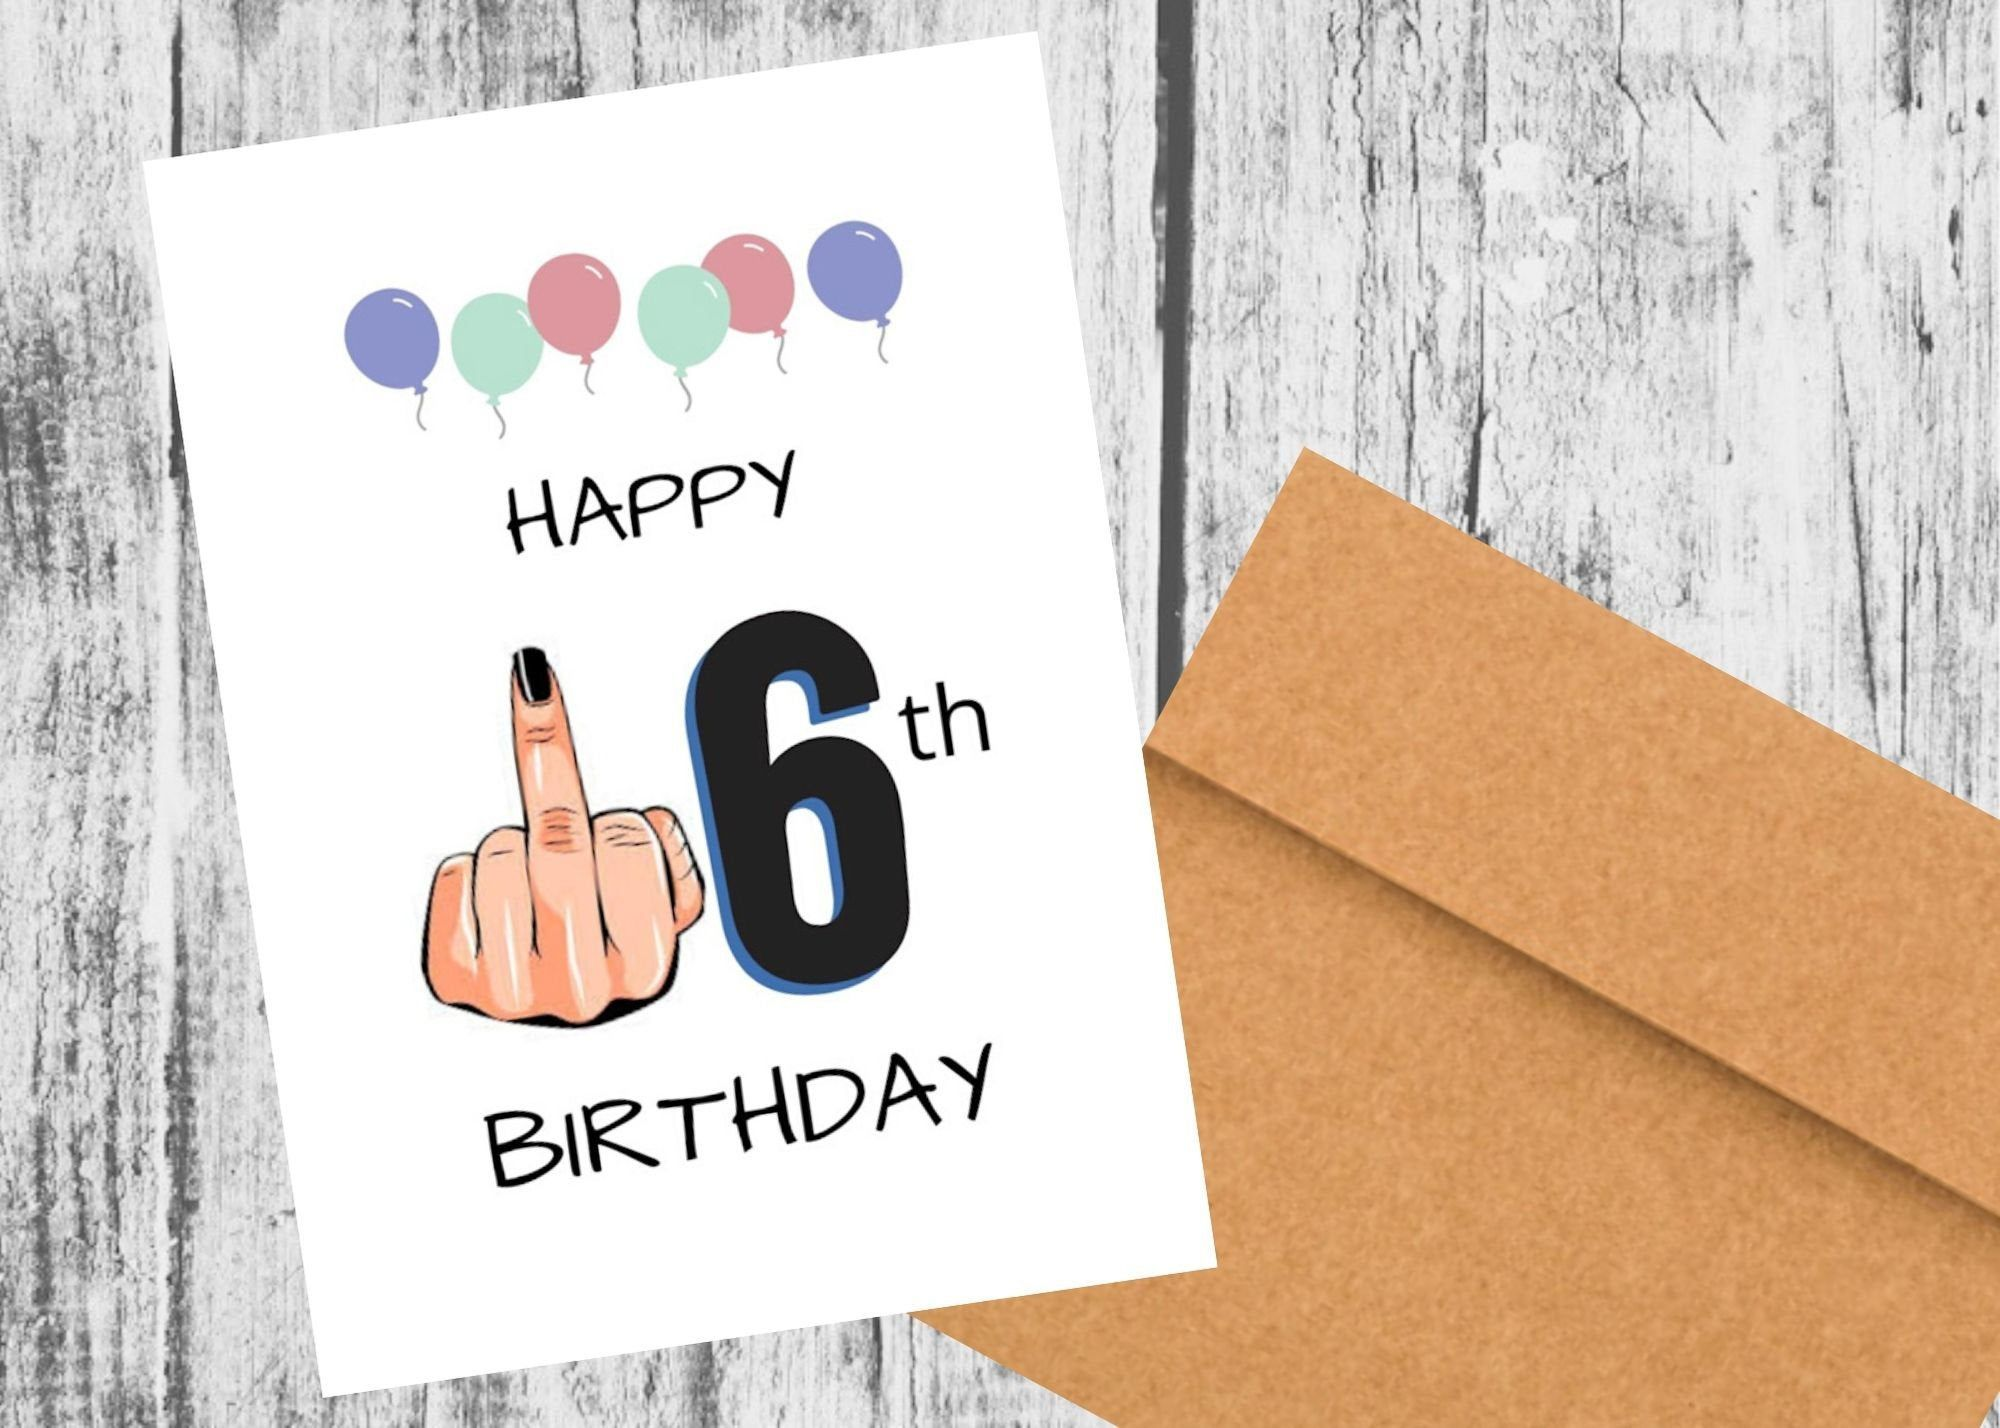 Sweet 16 Birthday Milestone 16th Birthday Card Funny Birthday Card For Her Him Funny Birthday Cards Anniversary Cards For Wife Anniversary Cards For Husband